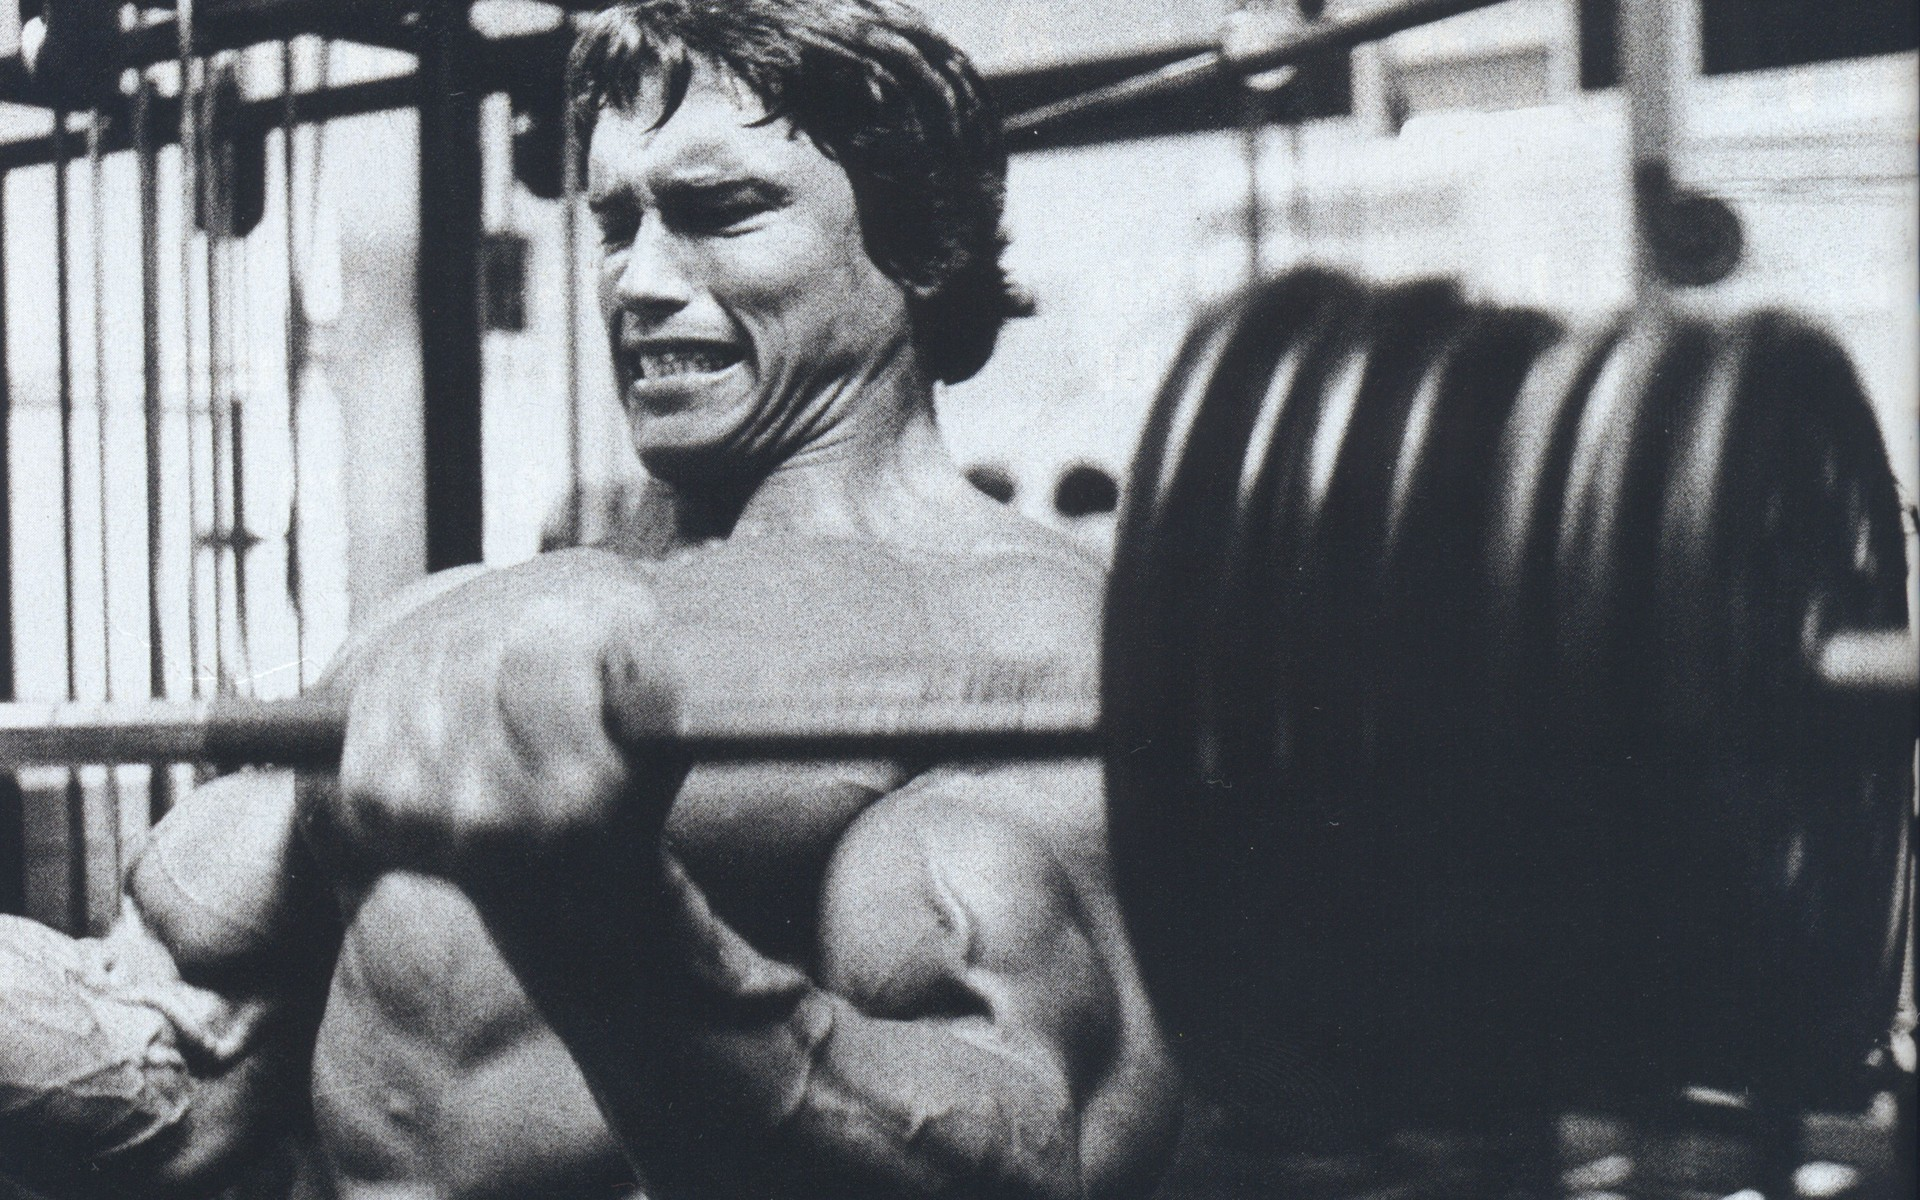 Arnold Schwarzenegger making muscles in 1977 docudrama Pumping Iron